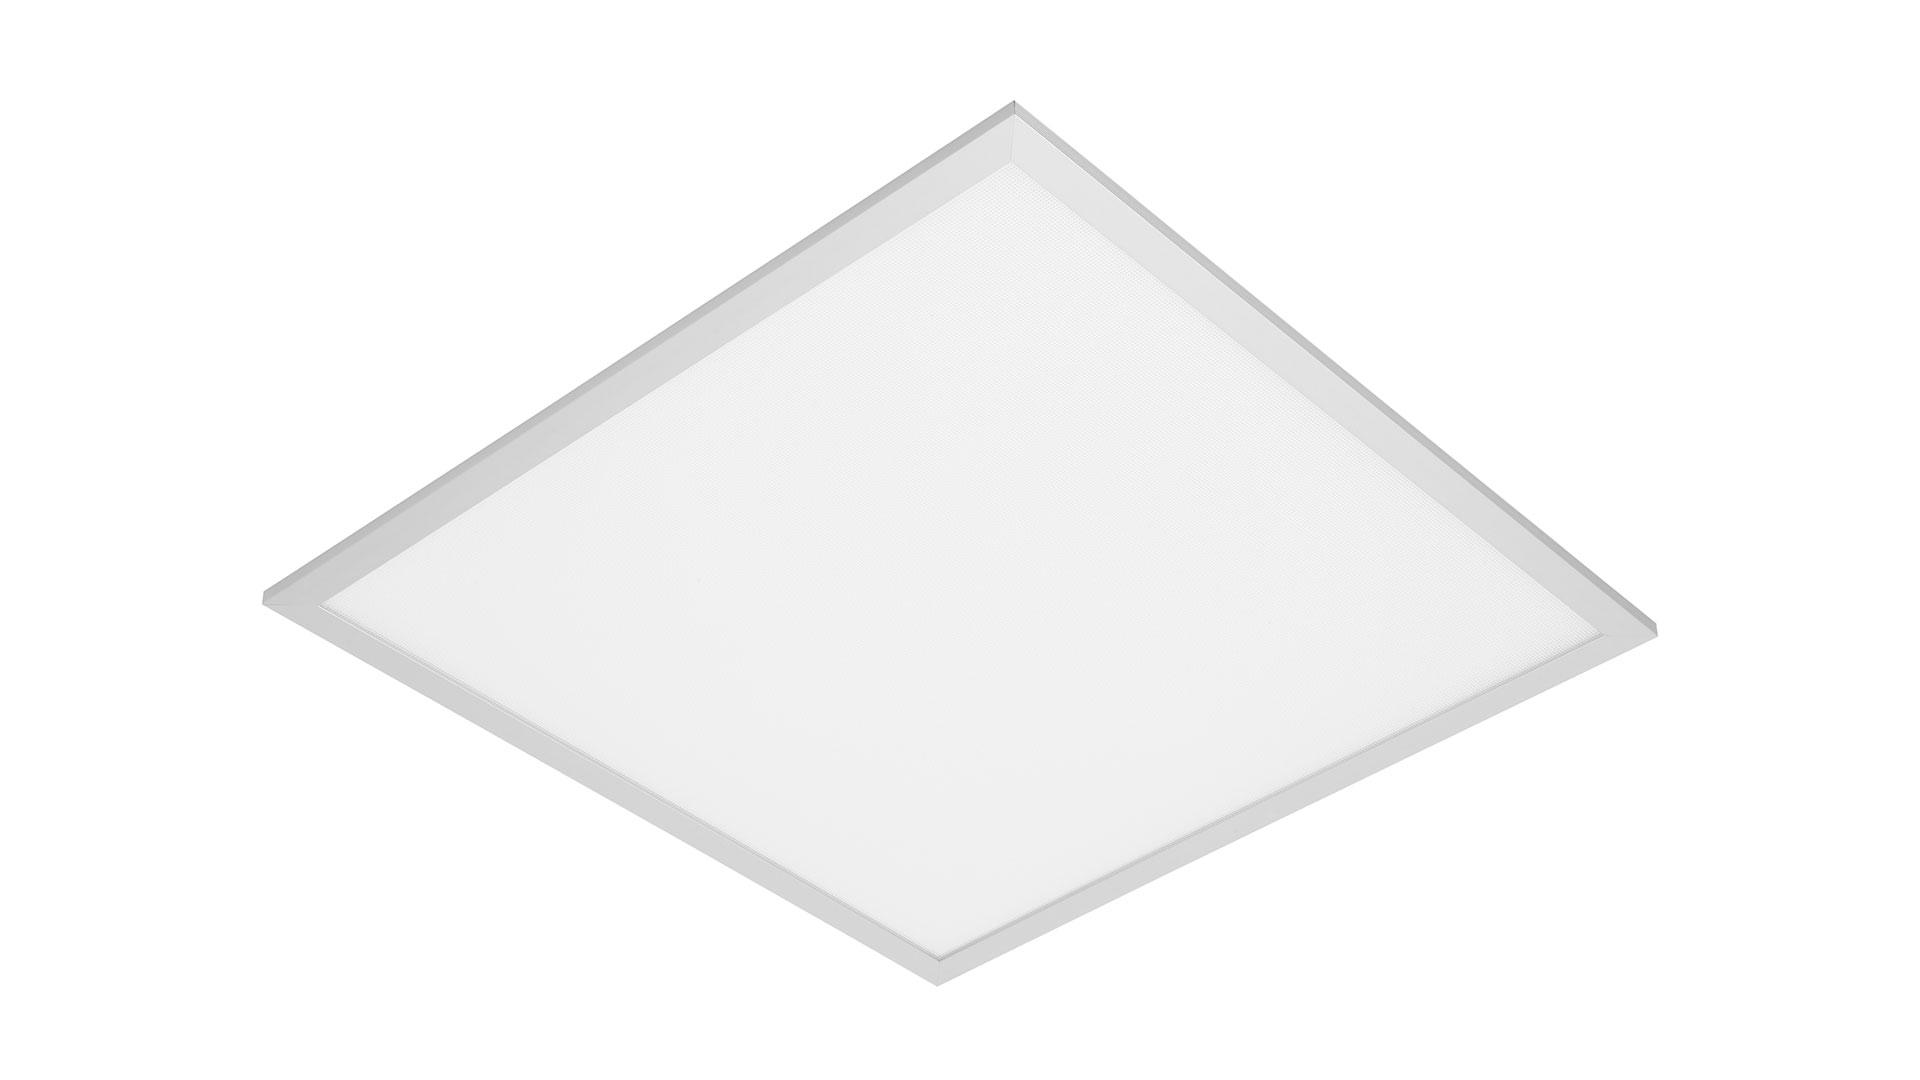 Lano PRO LED 43W, 4100lm, 830, microprisma, DALI, M625, weiß